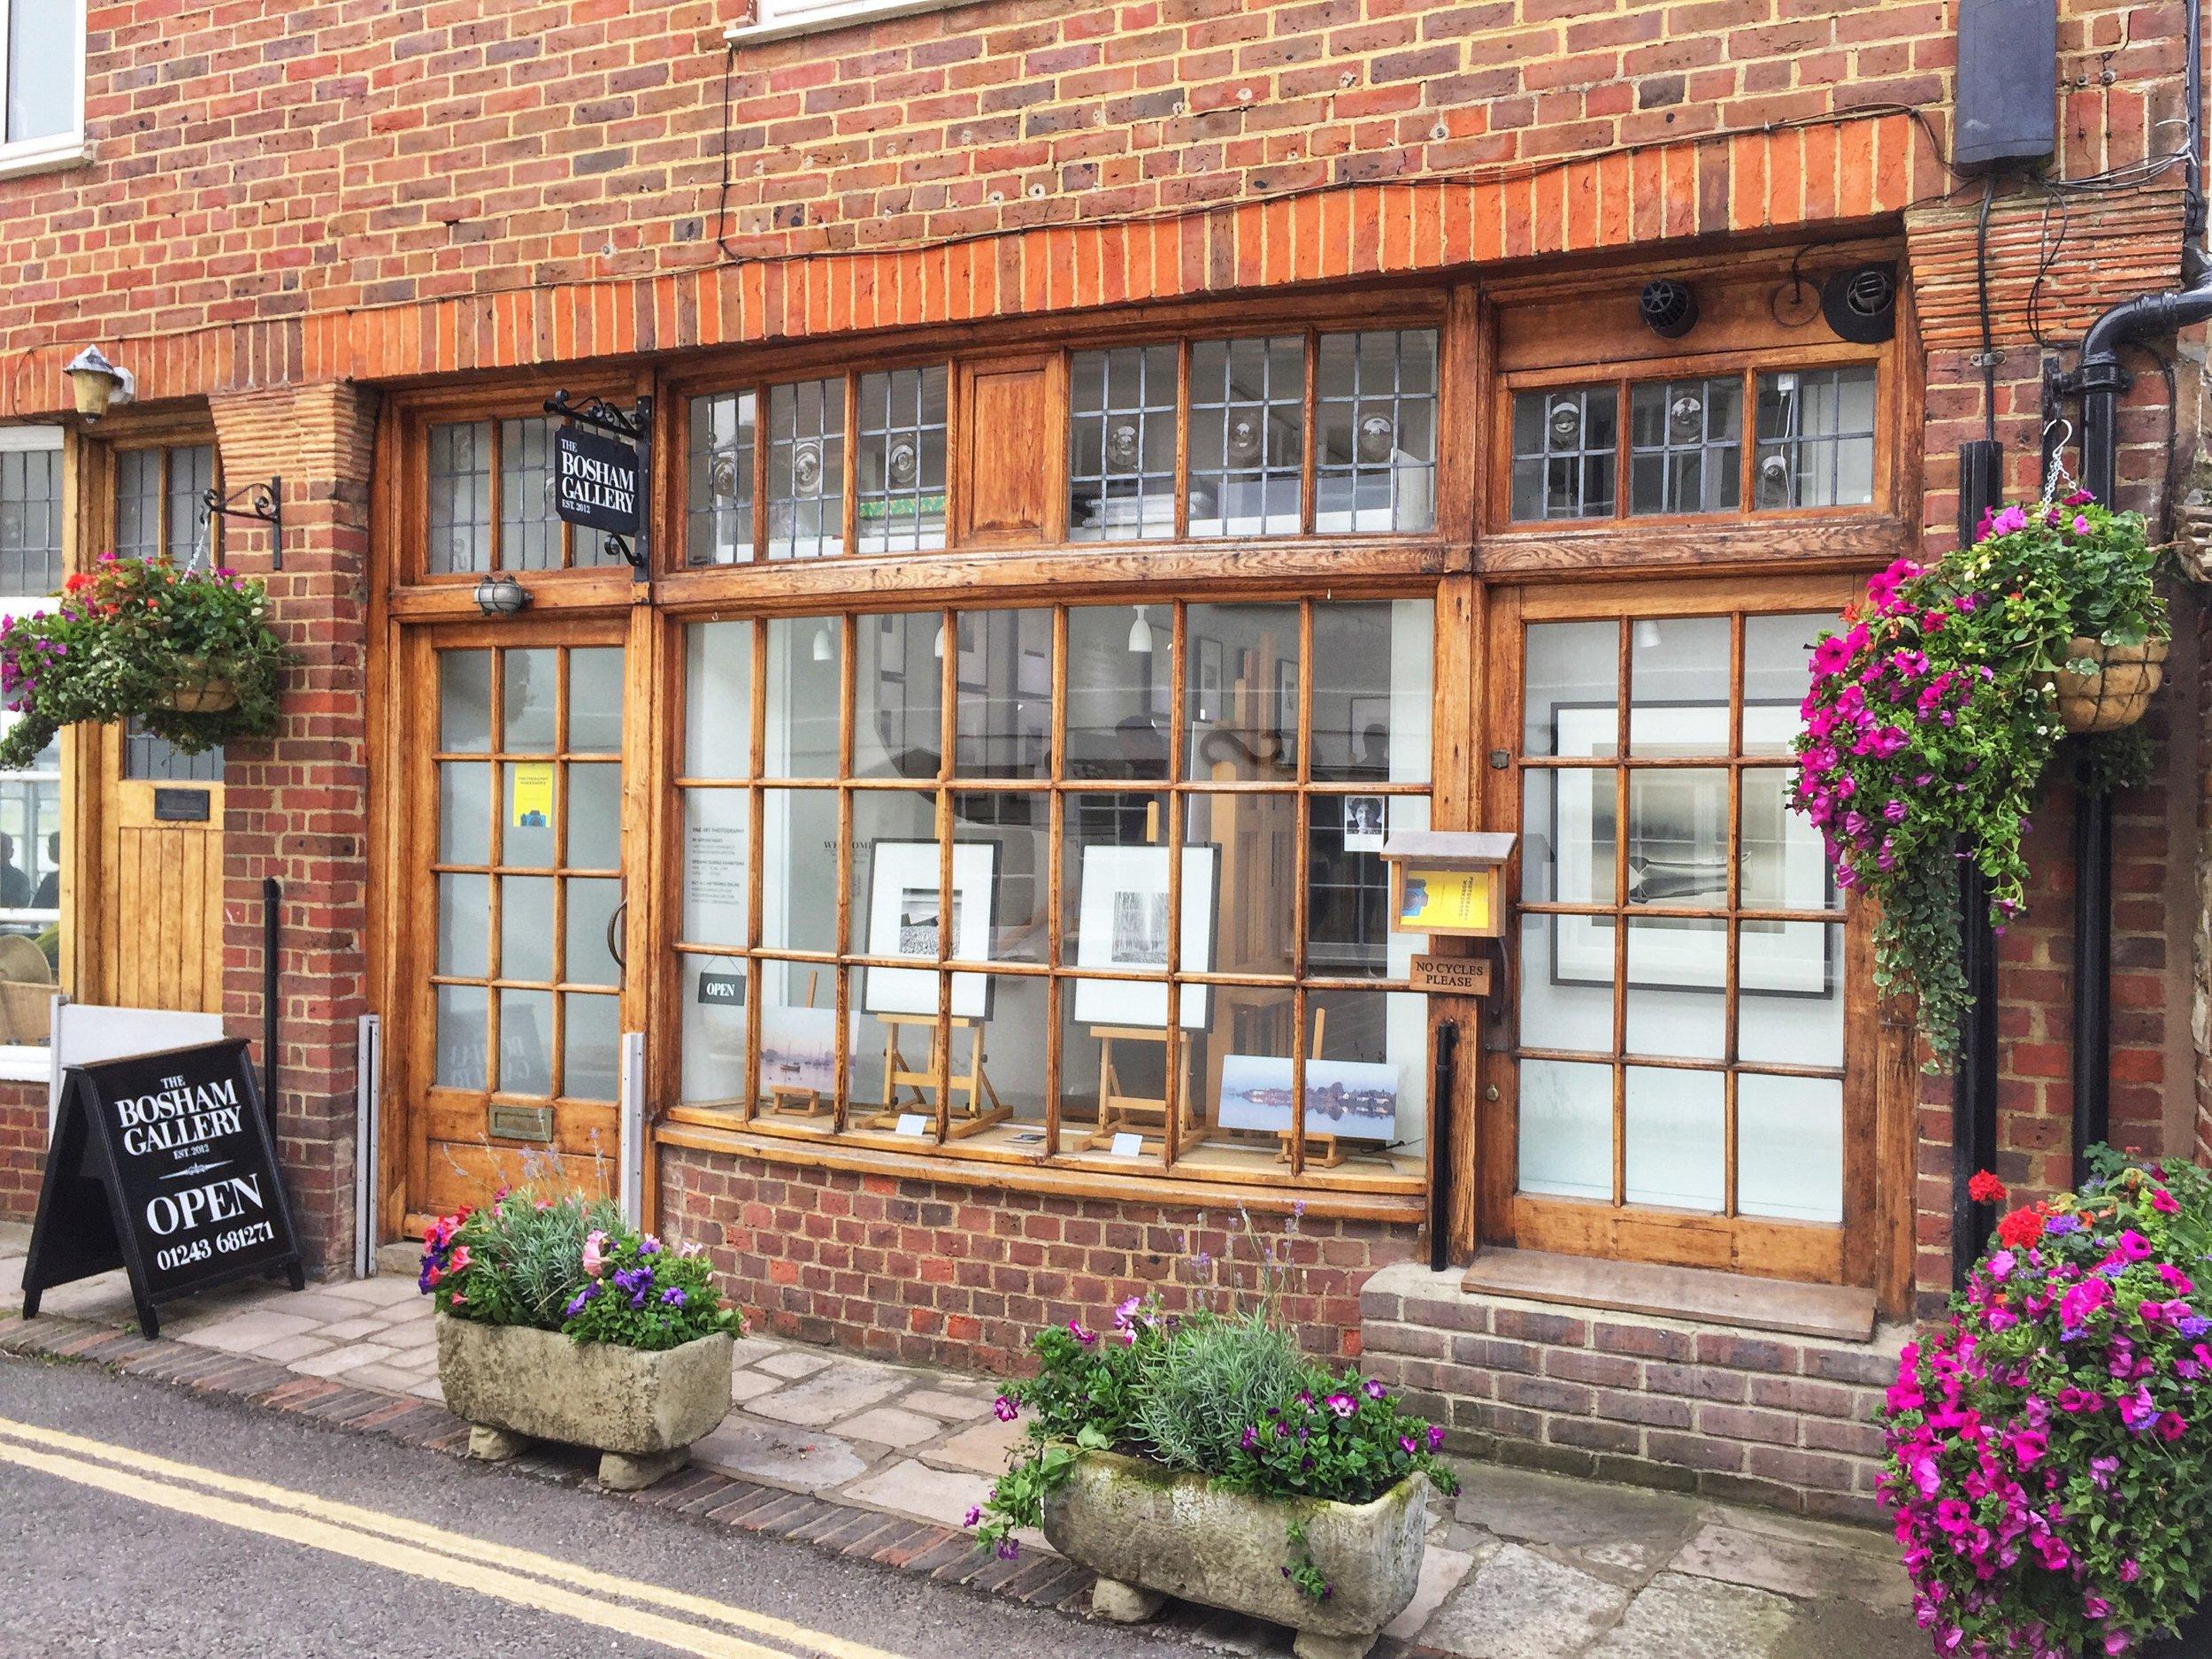 Bosham Gallery